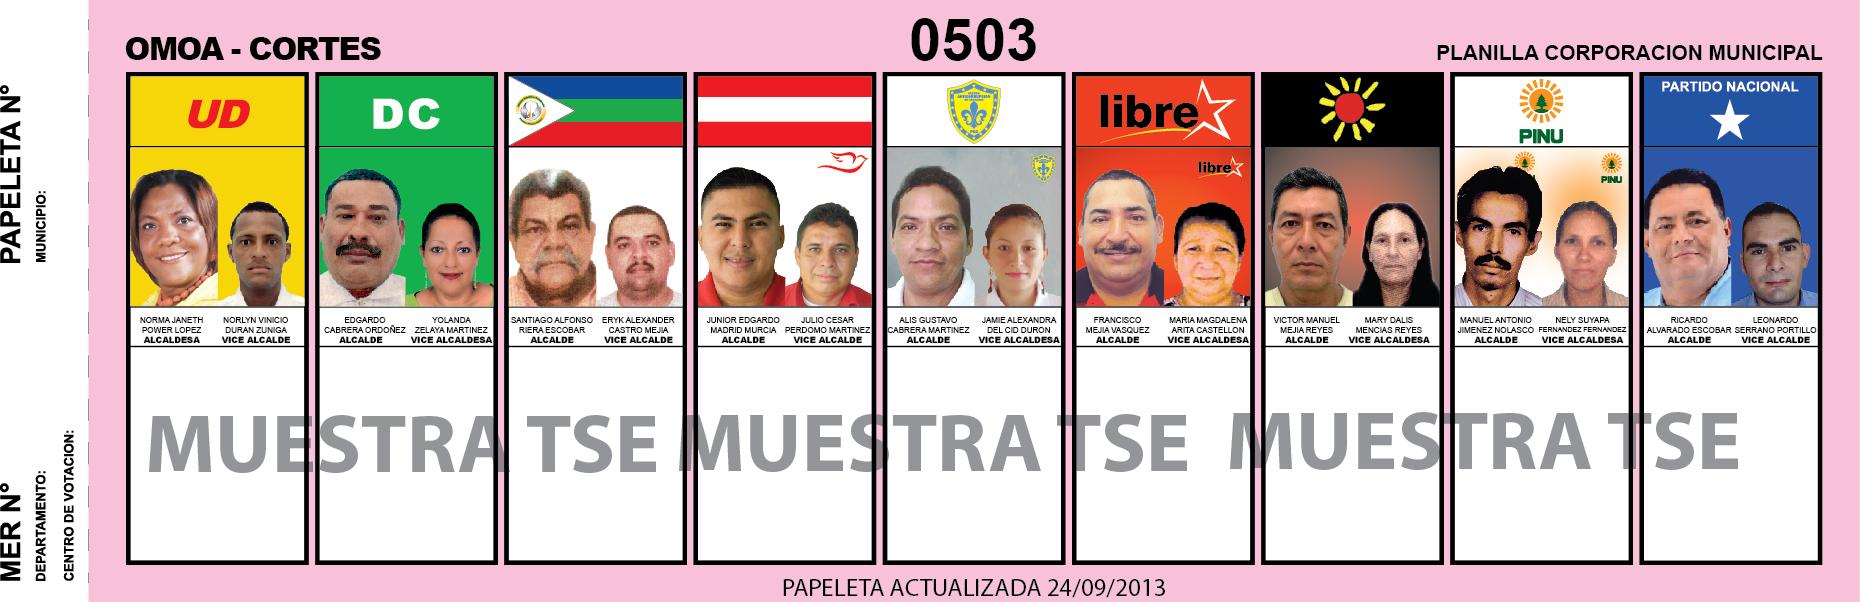 CANDIDATOS 2013 MUNICIPIO OMOA - CORTES - HONDURAS